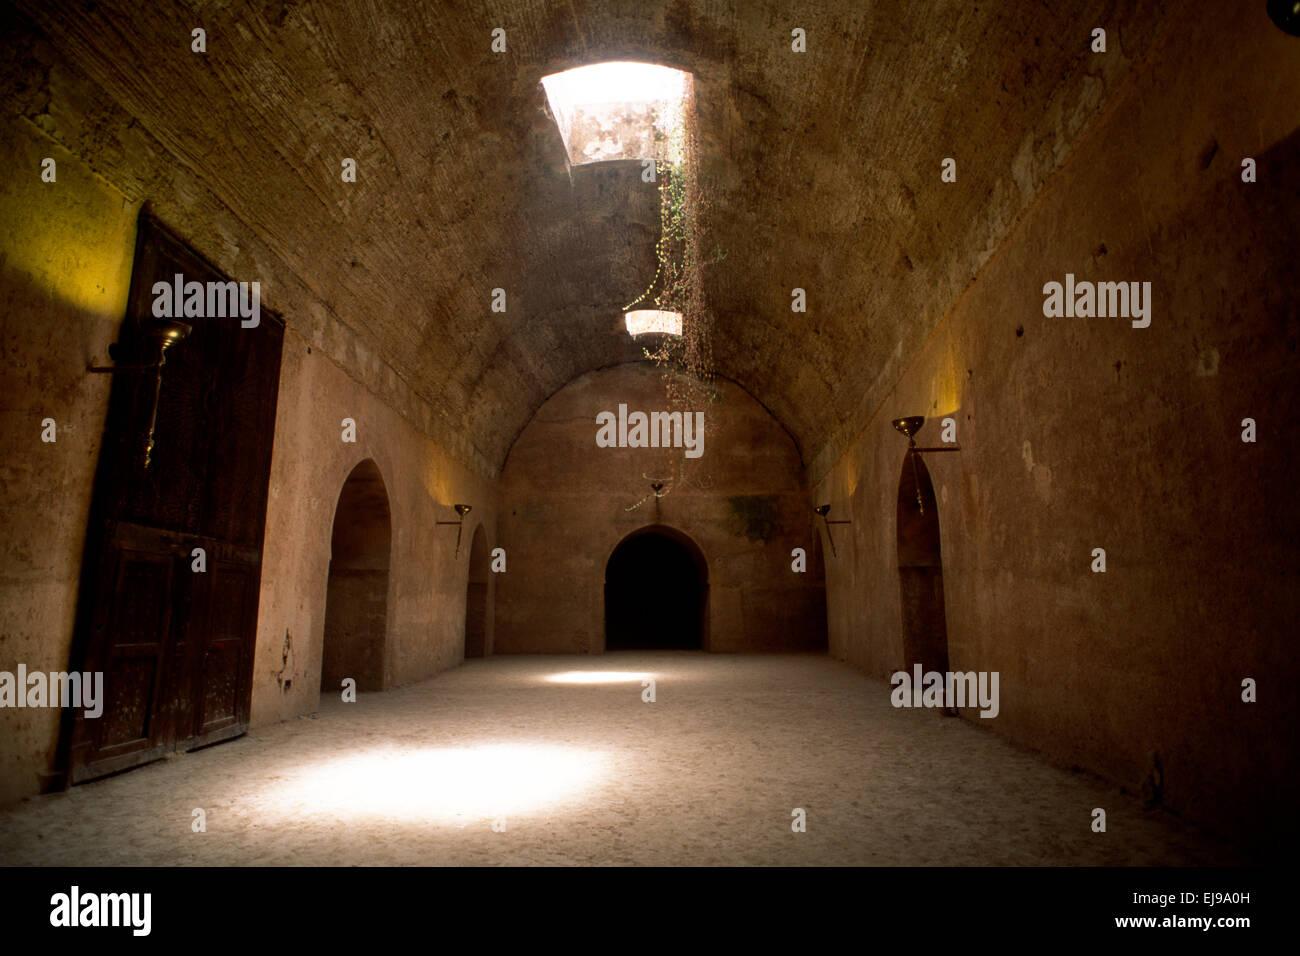 morocco, meknès, dar el ma, palace of the water, heri es souani, ancient barn - Stock Image